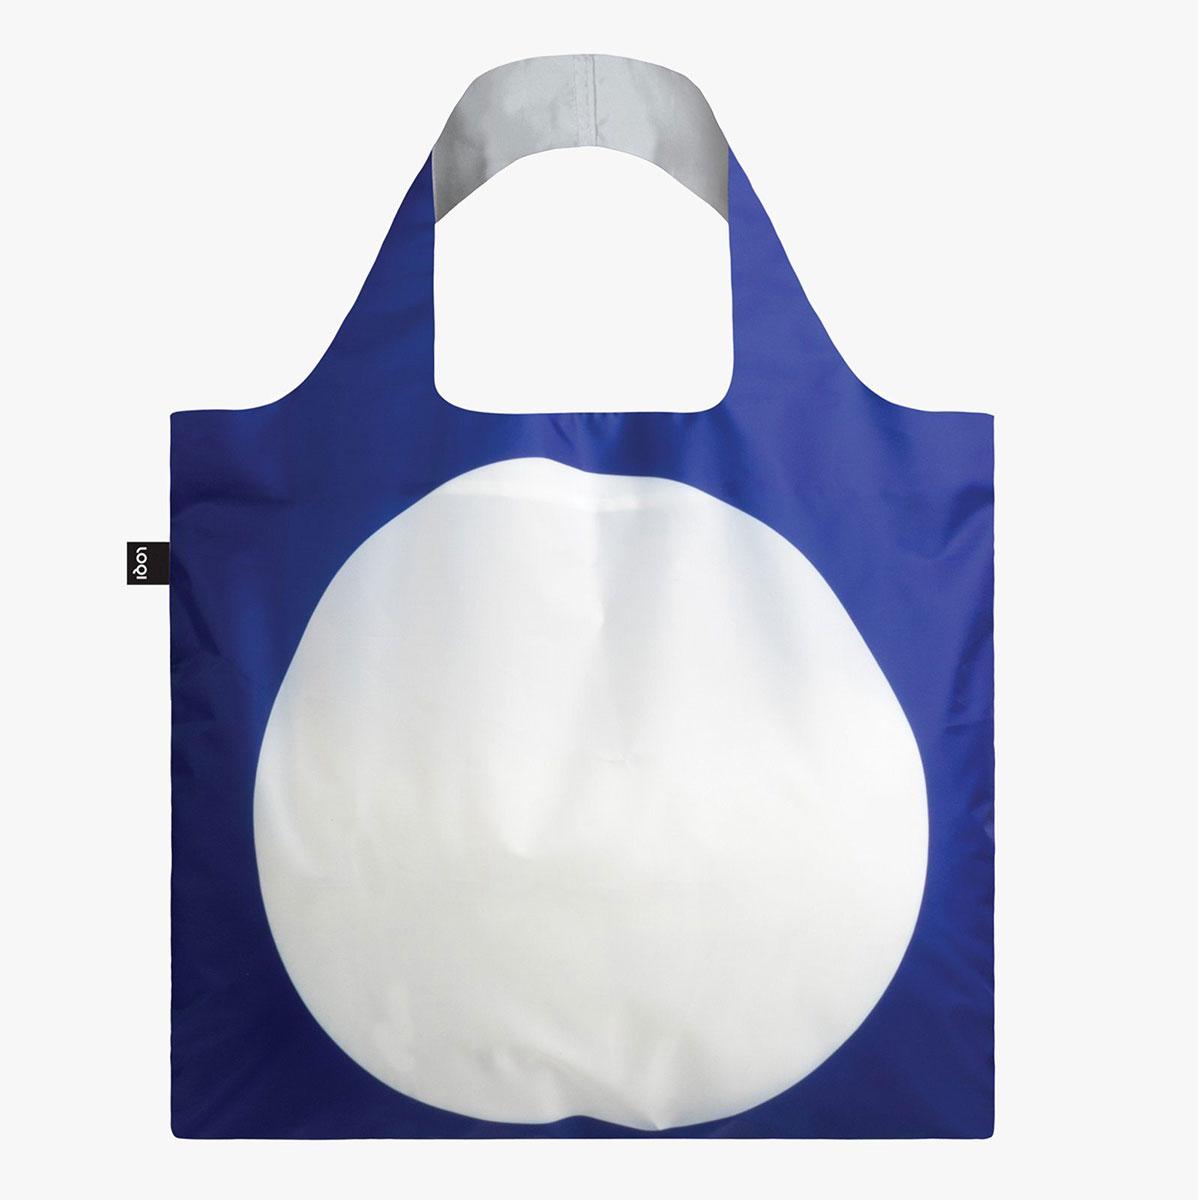 SW.EV-1810-LOQI-mak-museum-sagmeister-walsh-beauty-everybodys-favorite-form-bag-swing-tag-bag-main-RGB_5000x